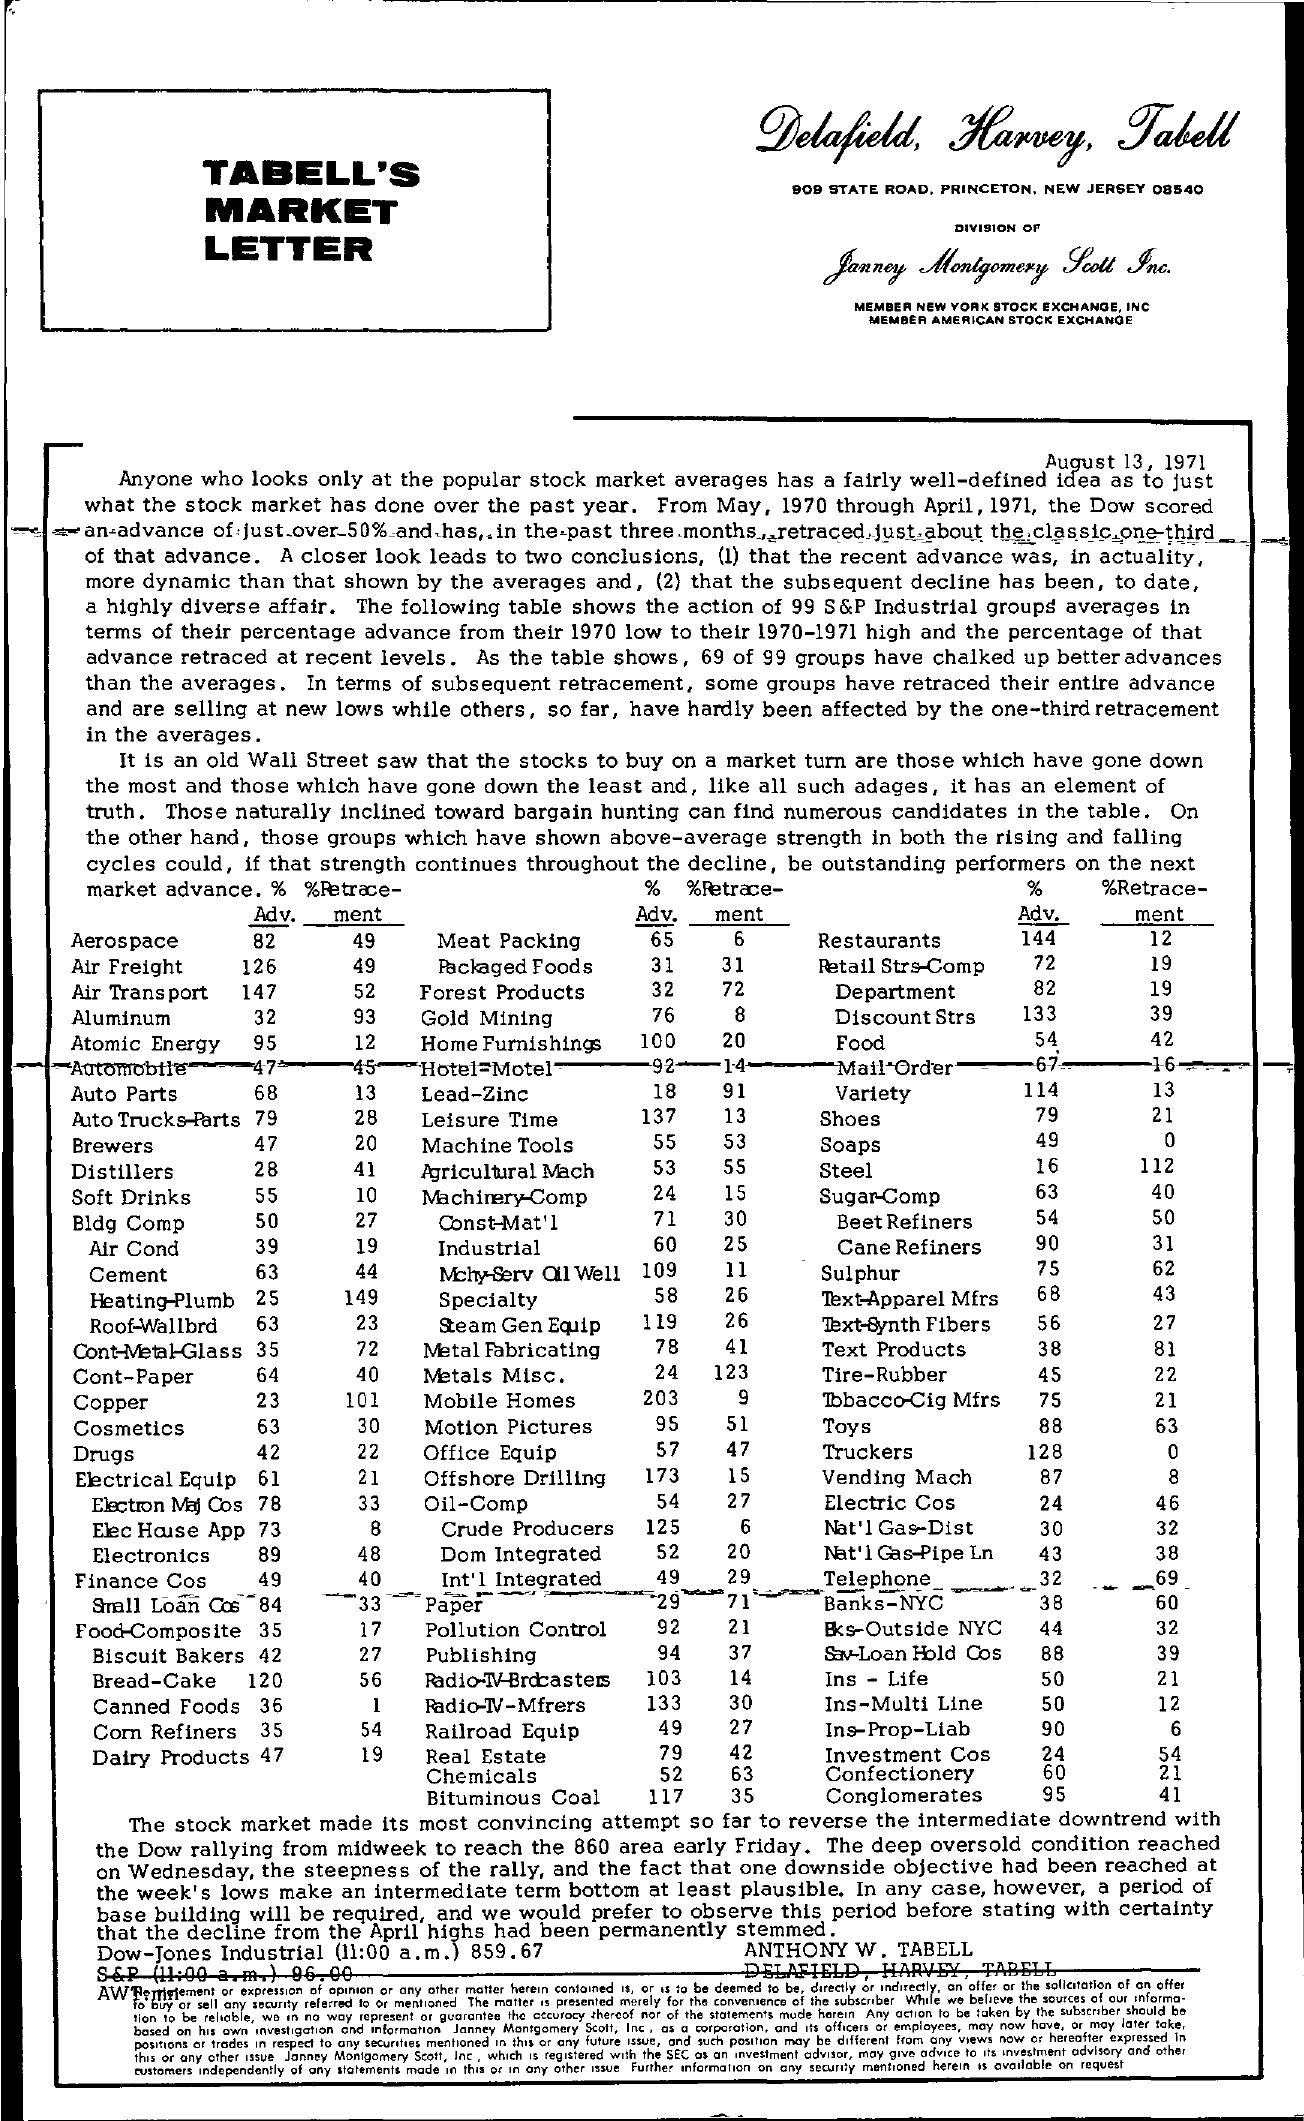 Tabell's Market Letter - August 13, 1971